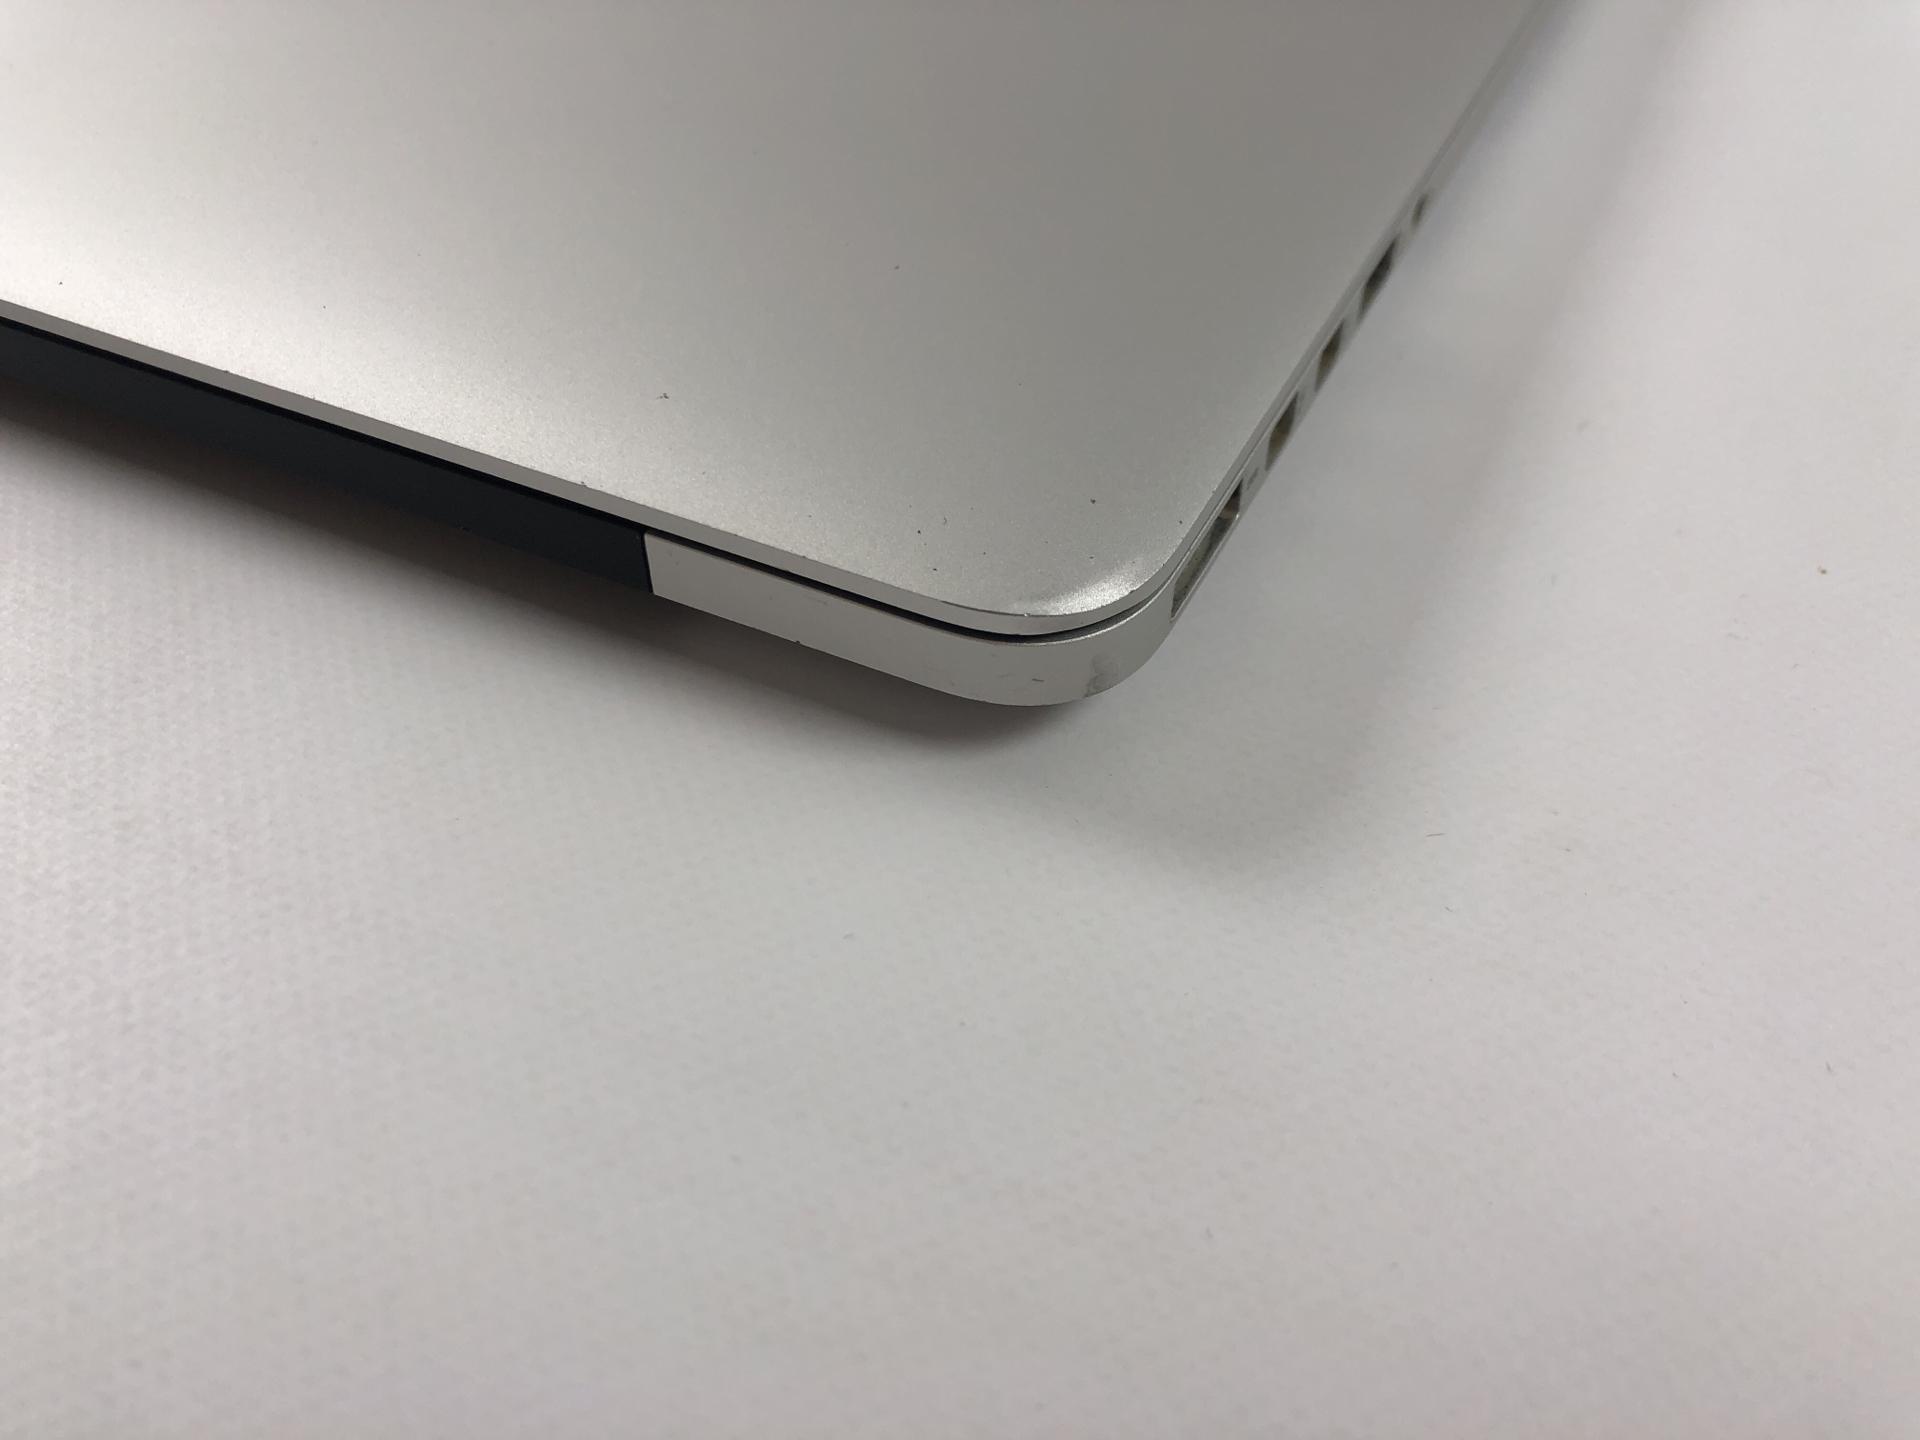 "MacBook Pro Retina 13"" Mid 2014 (Intel Core i5 2.6 GHz 8 GB RAM 256 GB SSD), Intel Core i5 2.6 GHz, 8 GB RAM, 256 GB SSD, obraz 3"